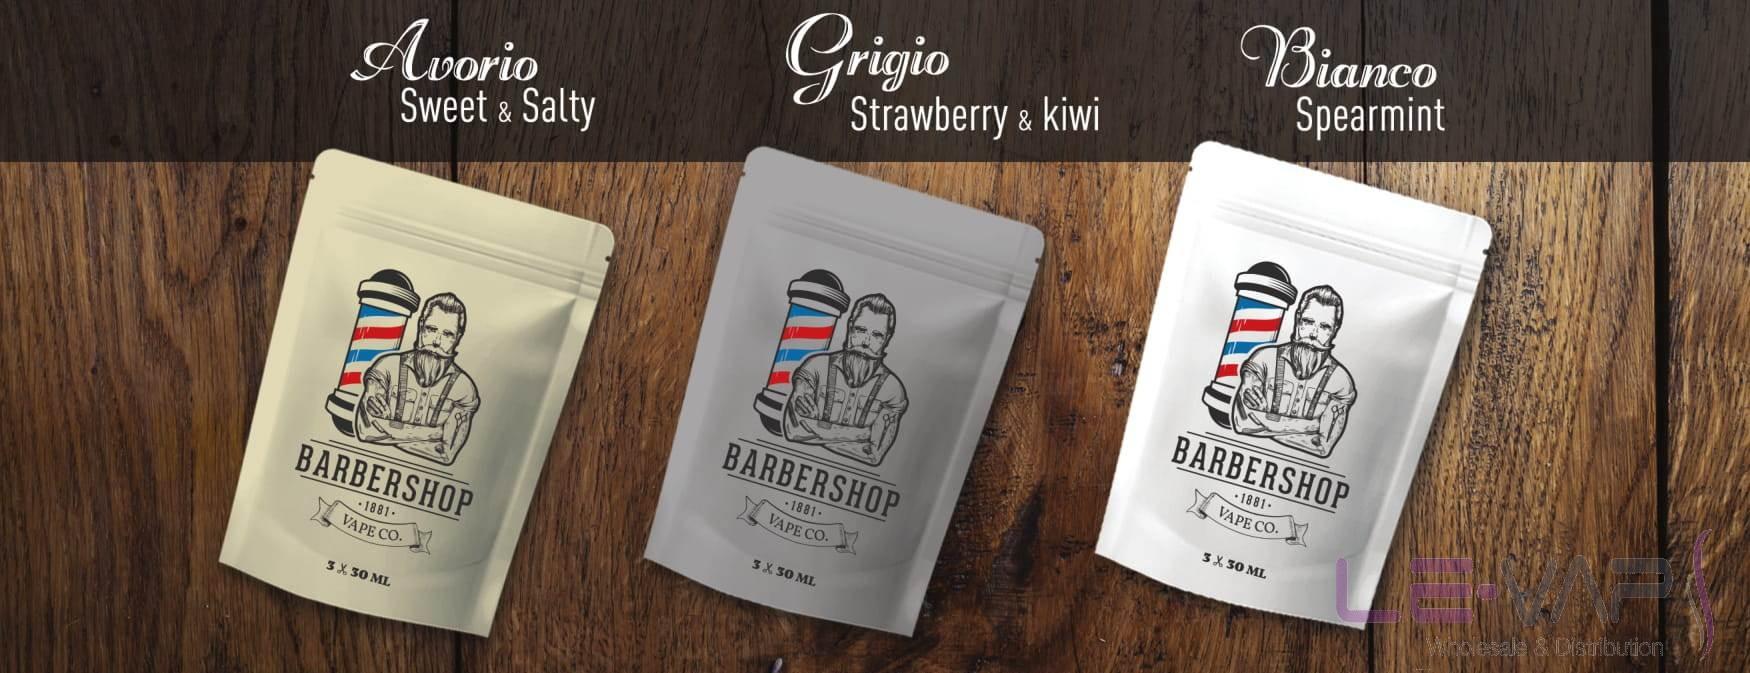 Bianco - Barbershop Vape Co